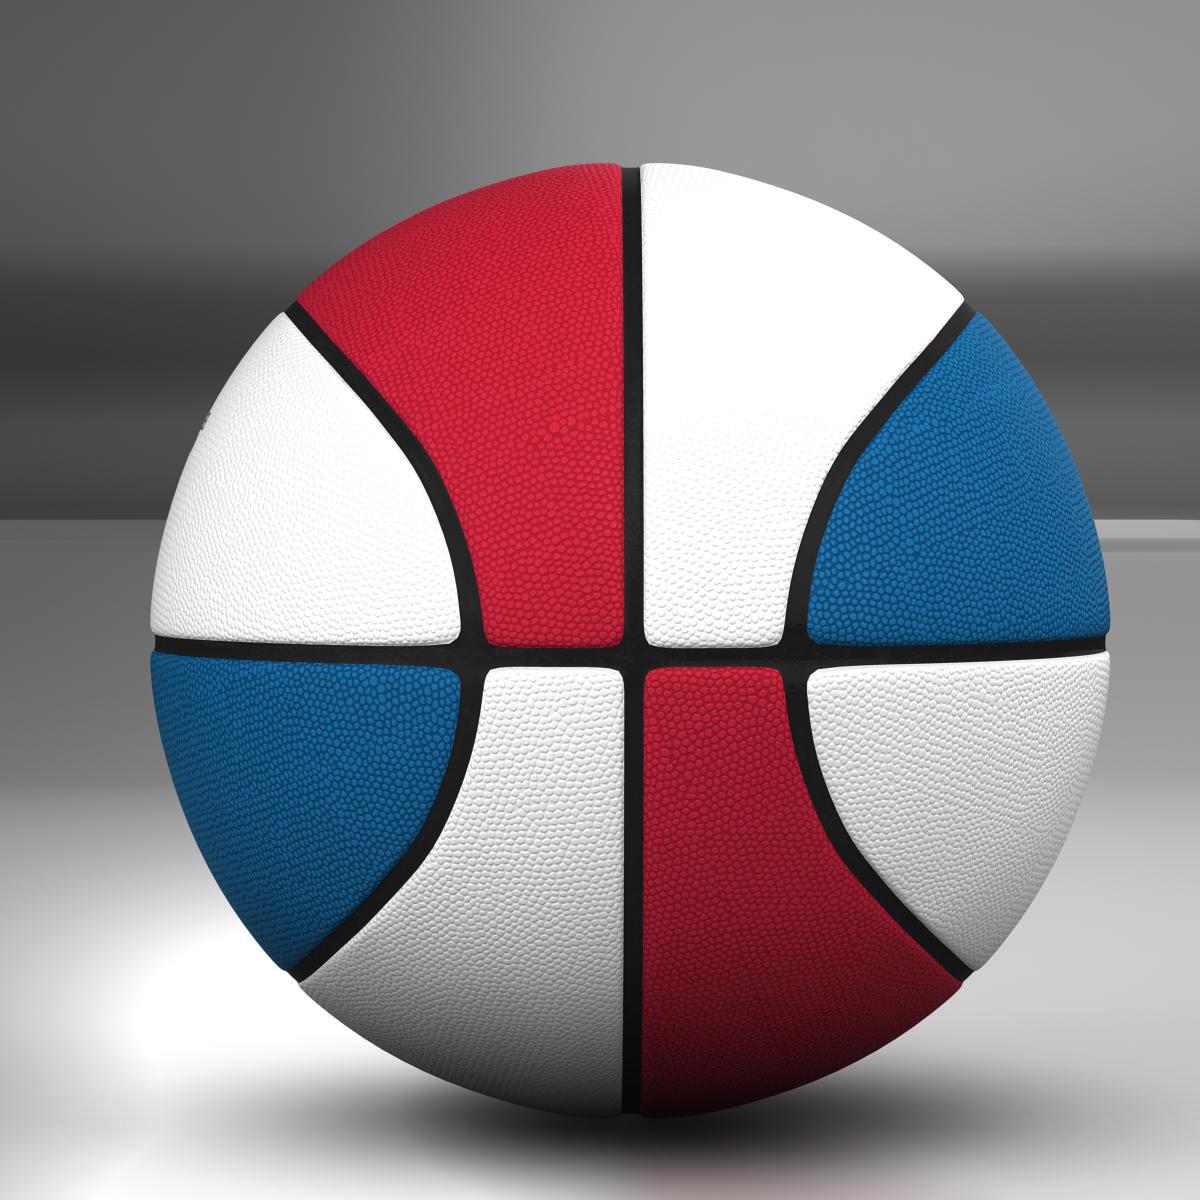 tricolor basketball ball 3d model 3ds max fbx c4d ma mb obj 164854